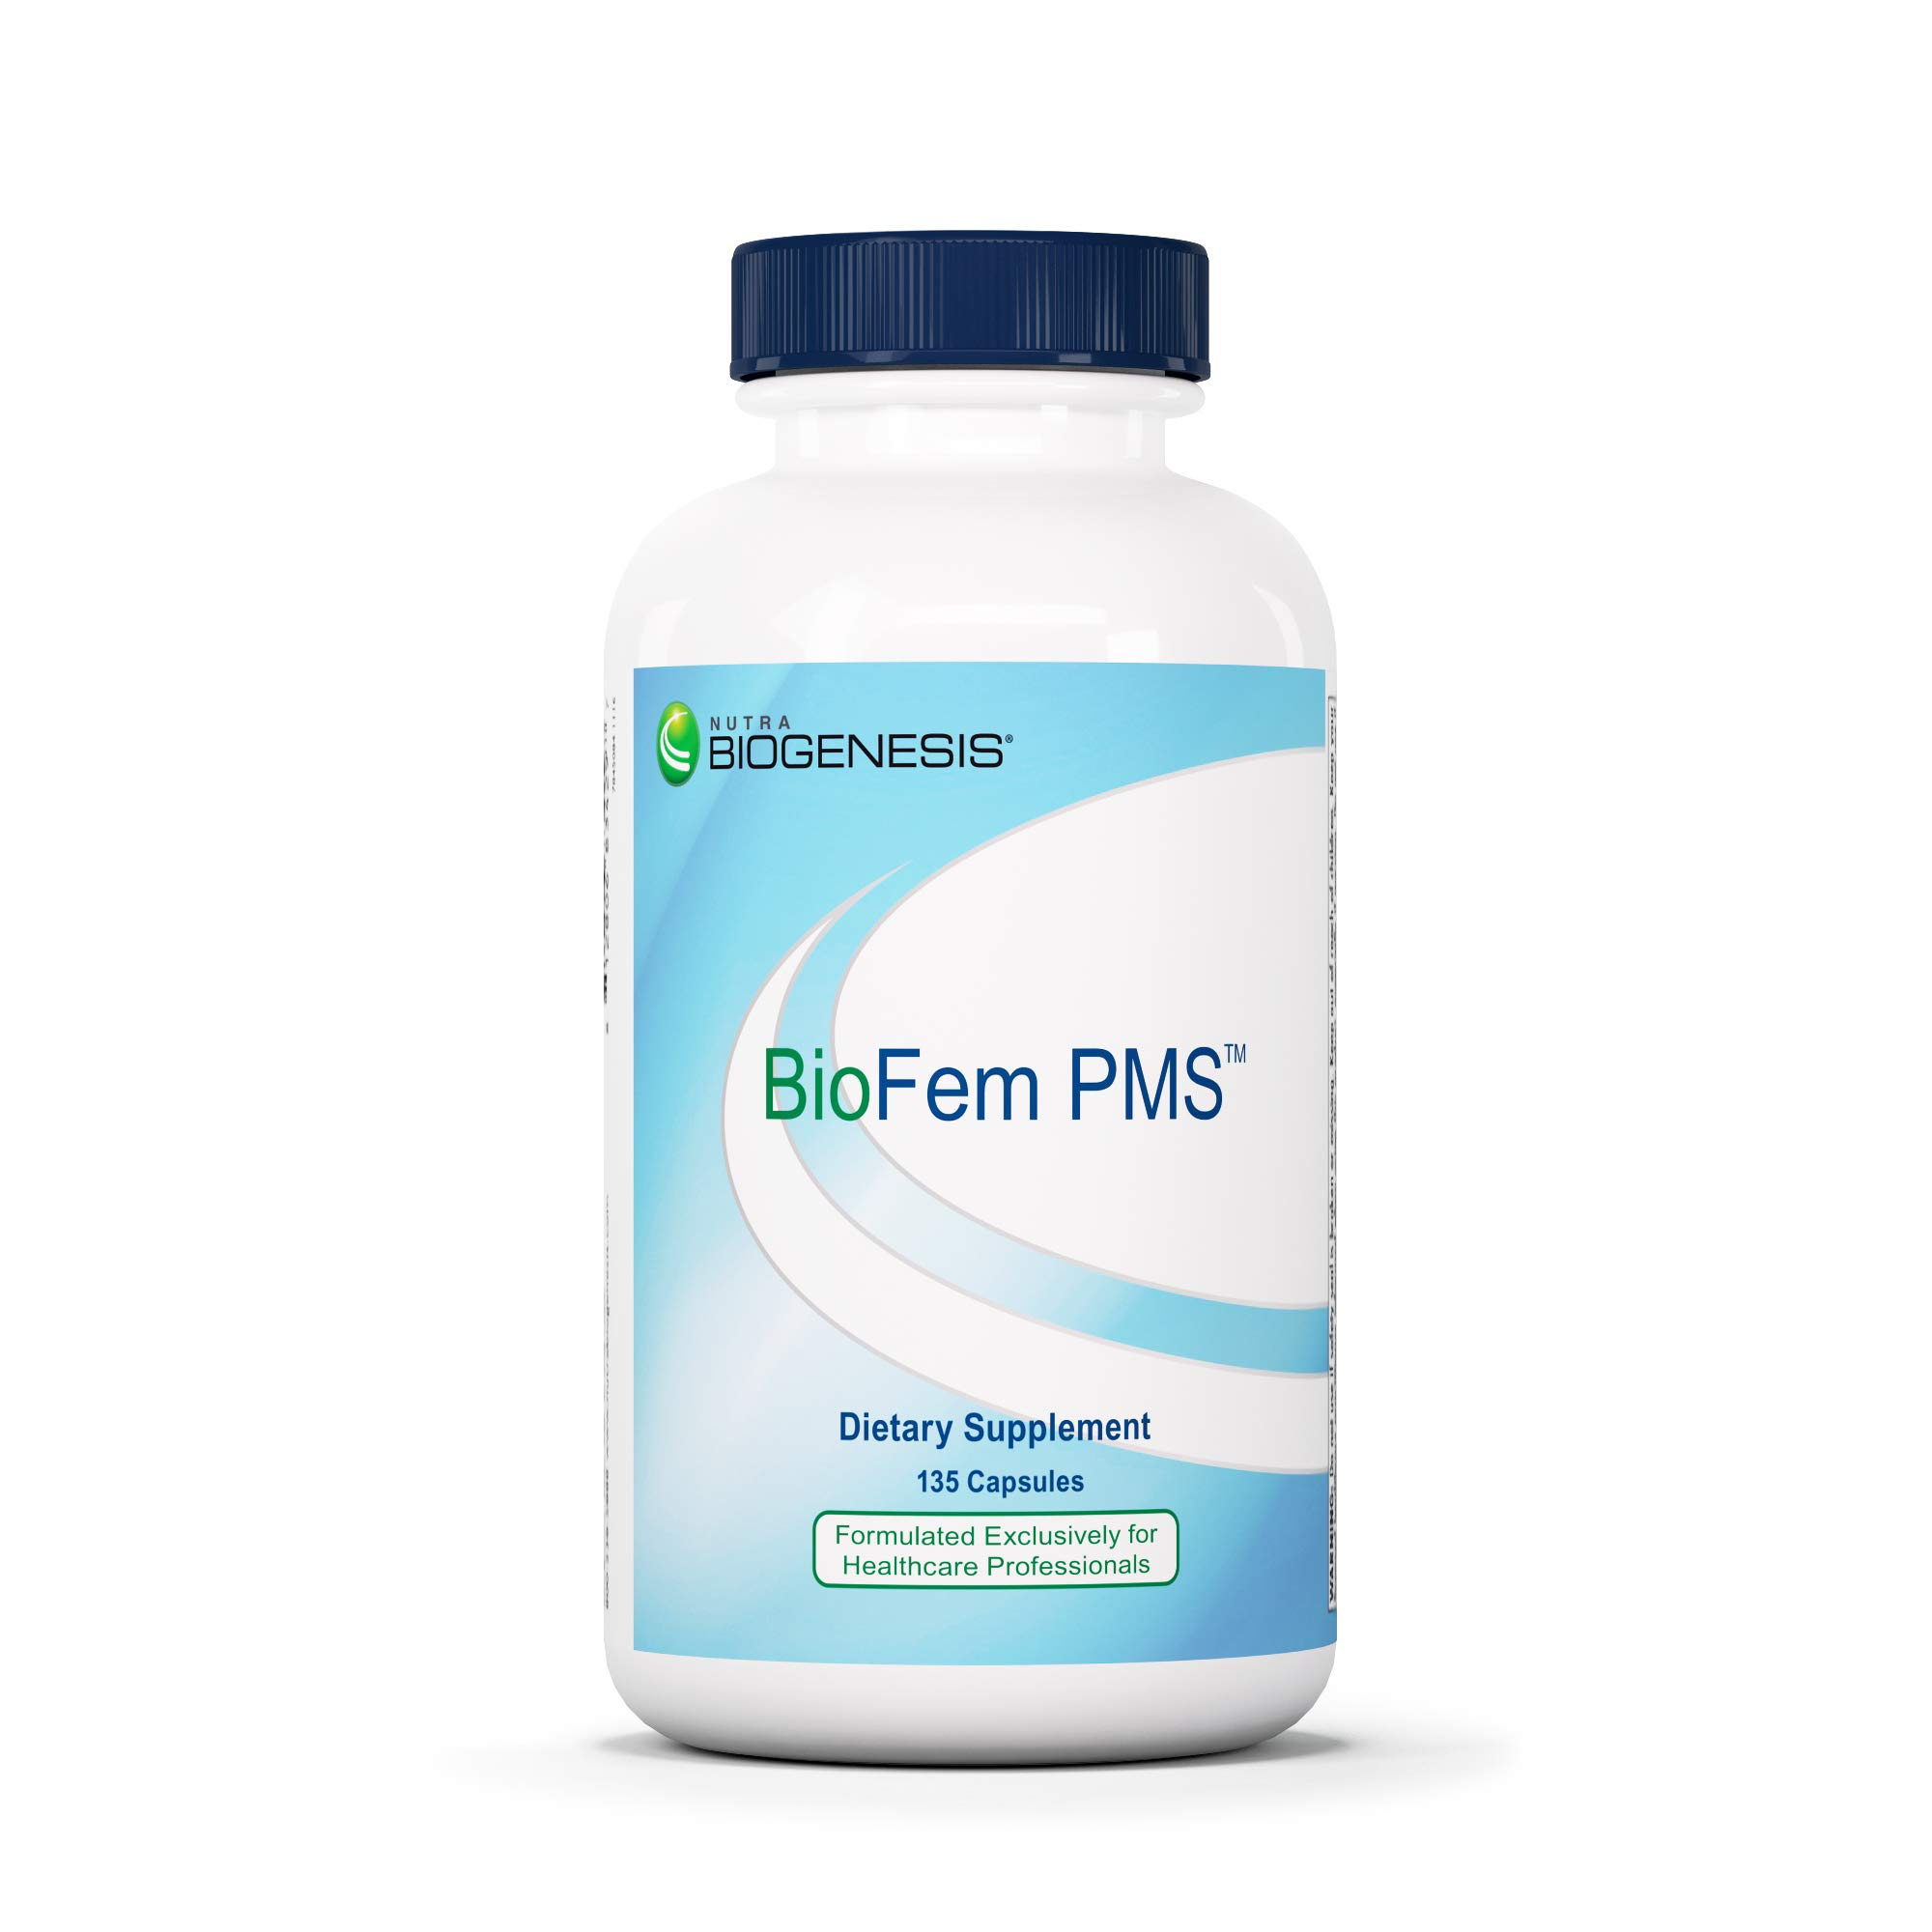 Biogenesis BioFem PMS - Wild Yam, Tumeric, Dong Quai, and Black Cohosh to Support PMS Relief - 135 Capsules